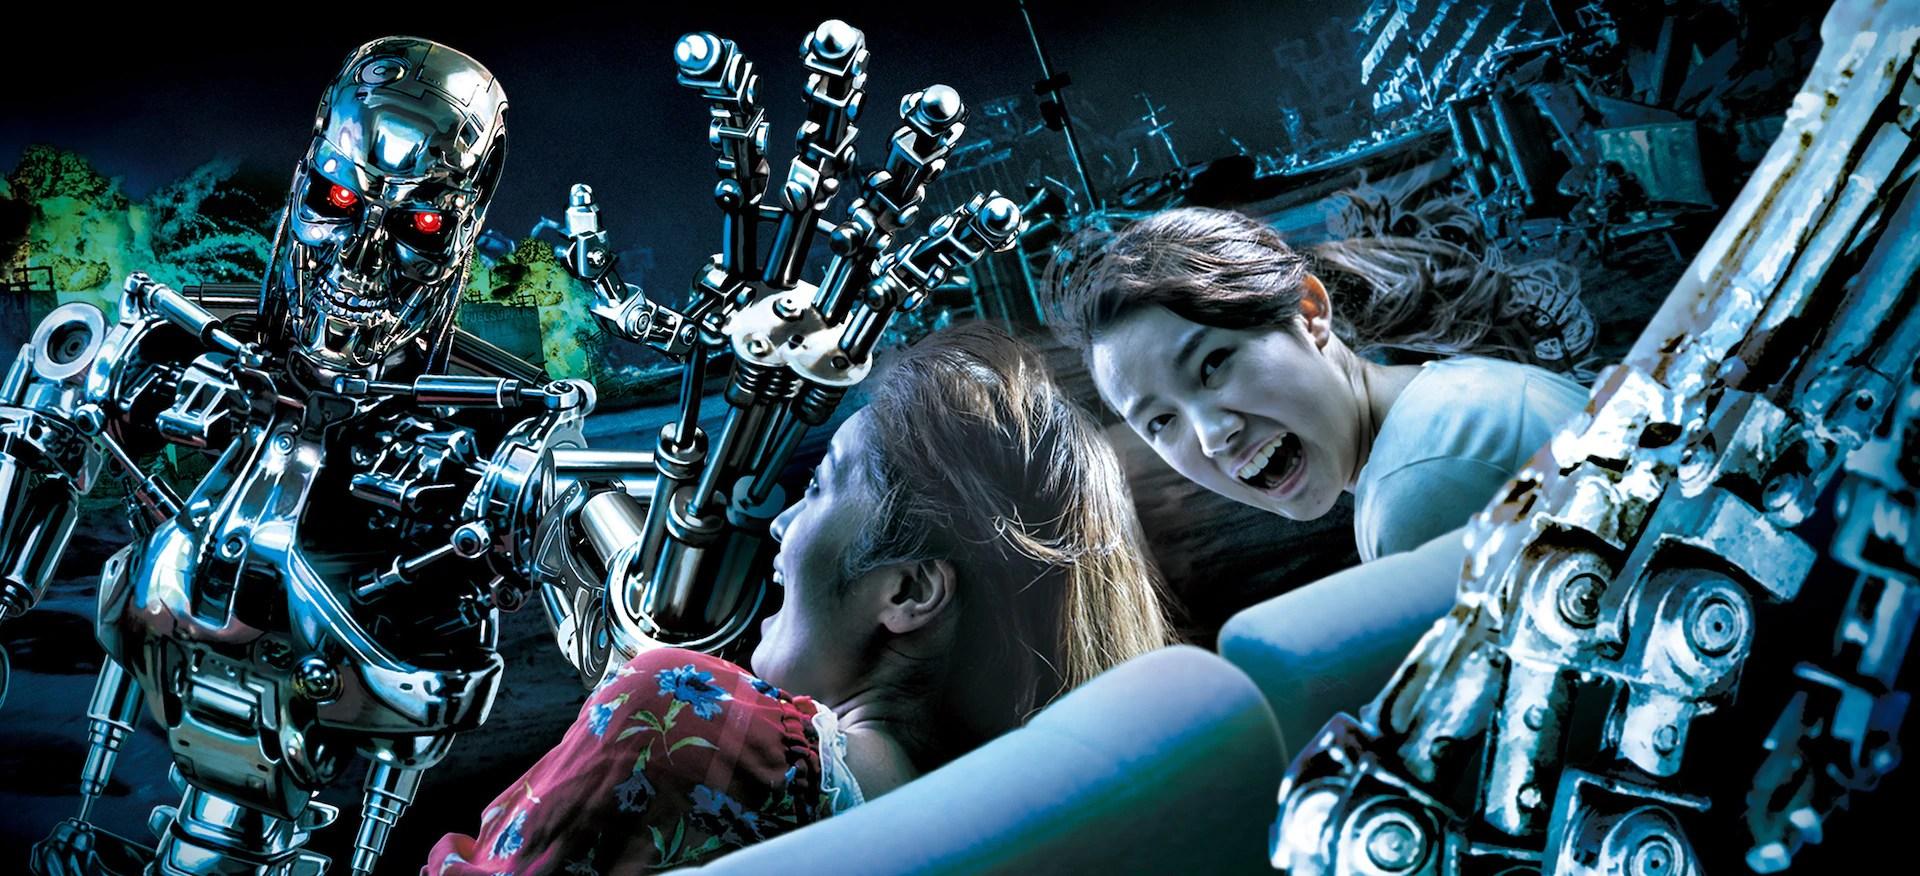 Terminator 2 3D Battle Across Time Universal Studios Japan